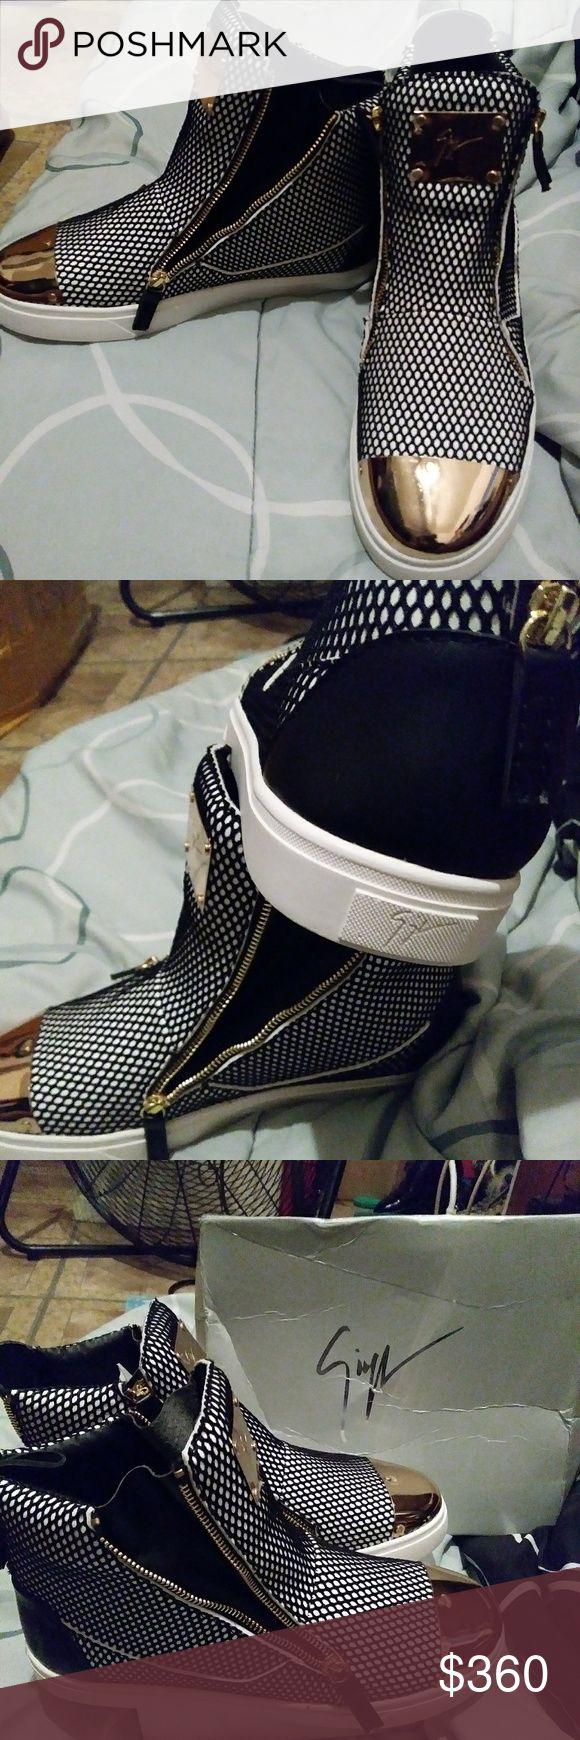 Giuseppe zanotti. In box dust bag, exclusive Giuseppe zanotti men fashion shoes 41( 8.5)  maybe would fit like a 9 Giuseppe Zanotti Shoes Sneakers